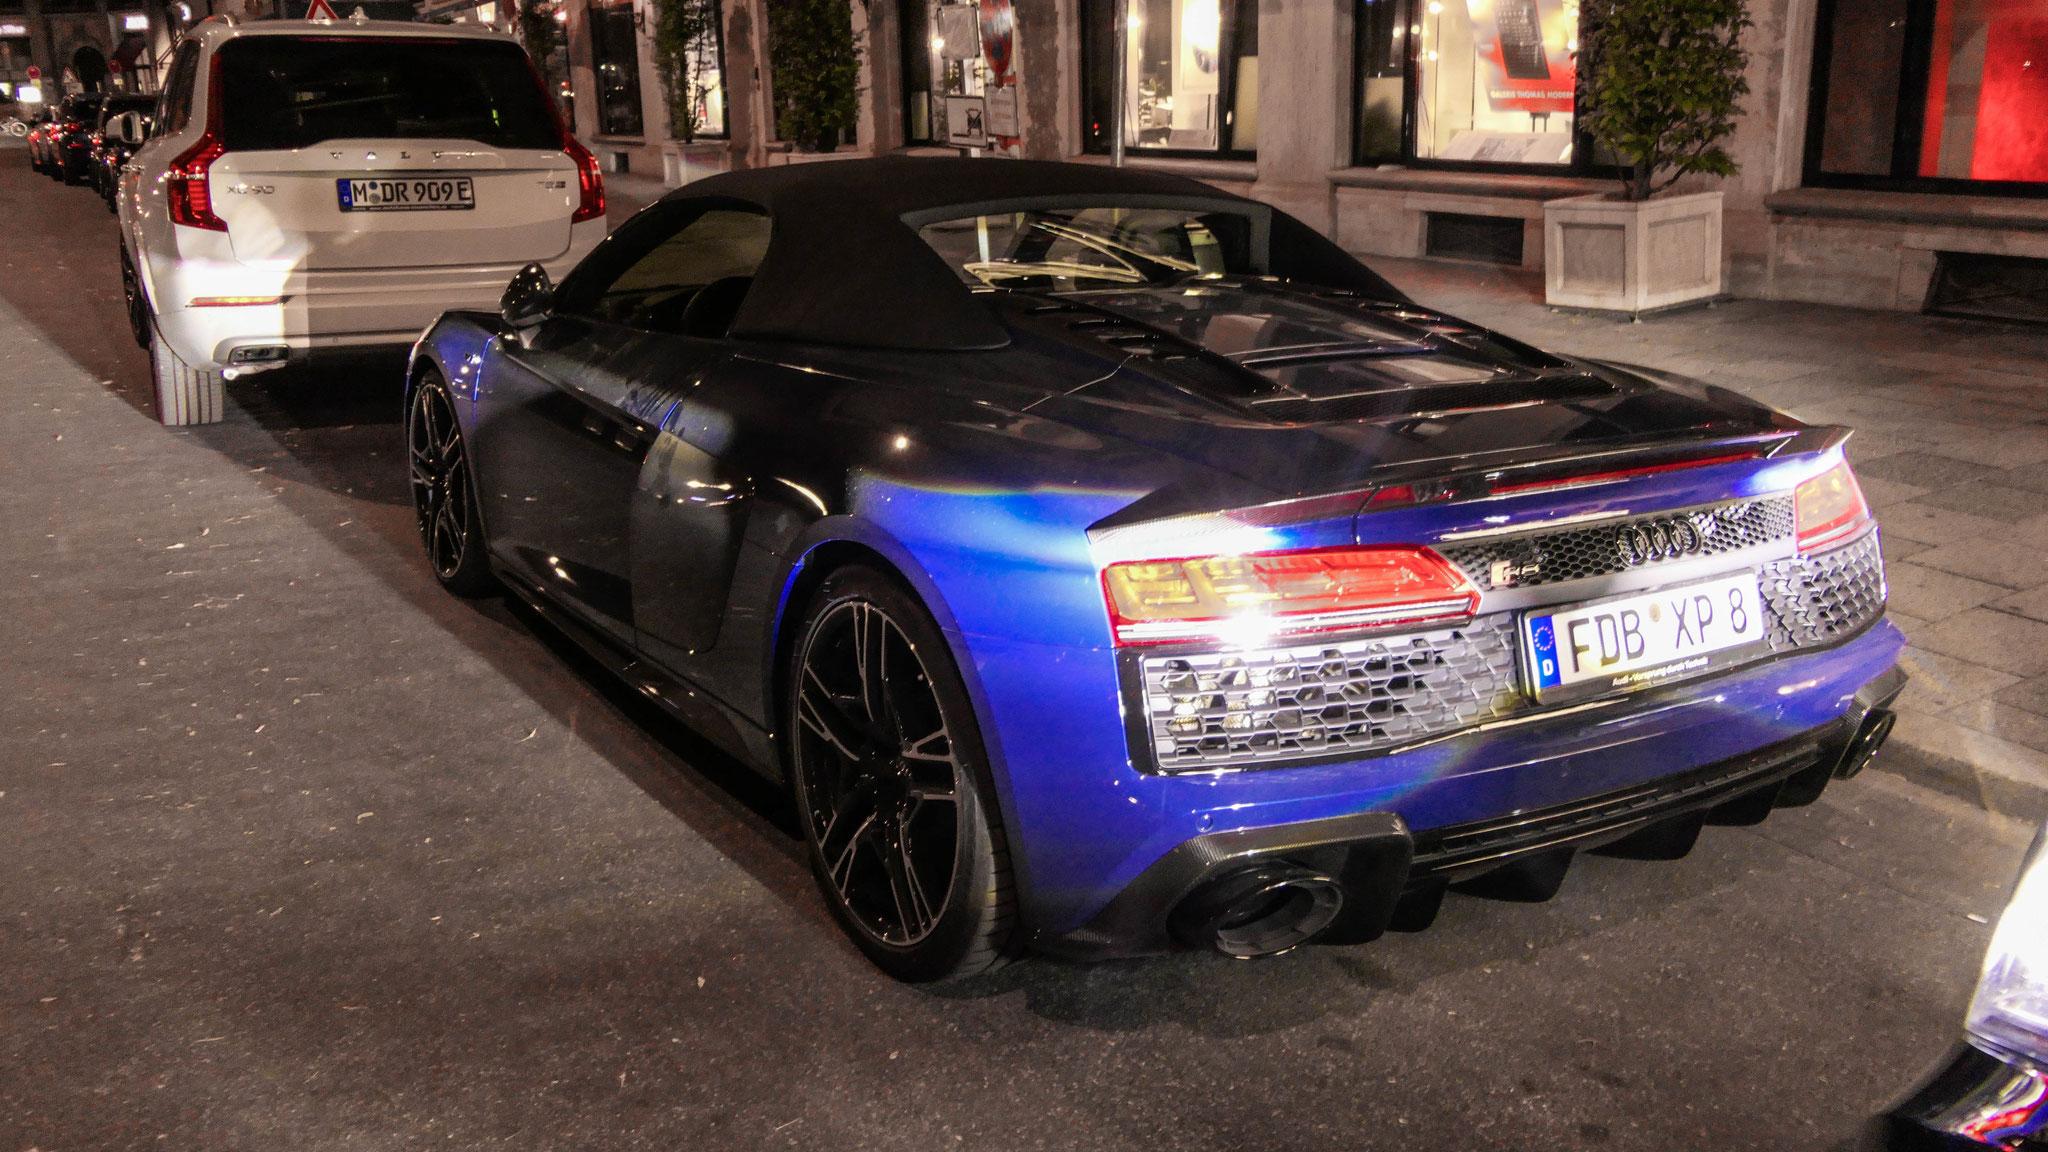 Audi R8 V10 Spyder - FDB-XP-8